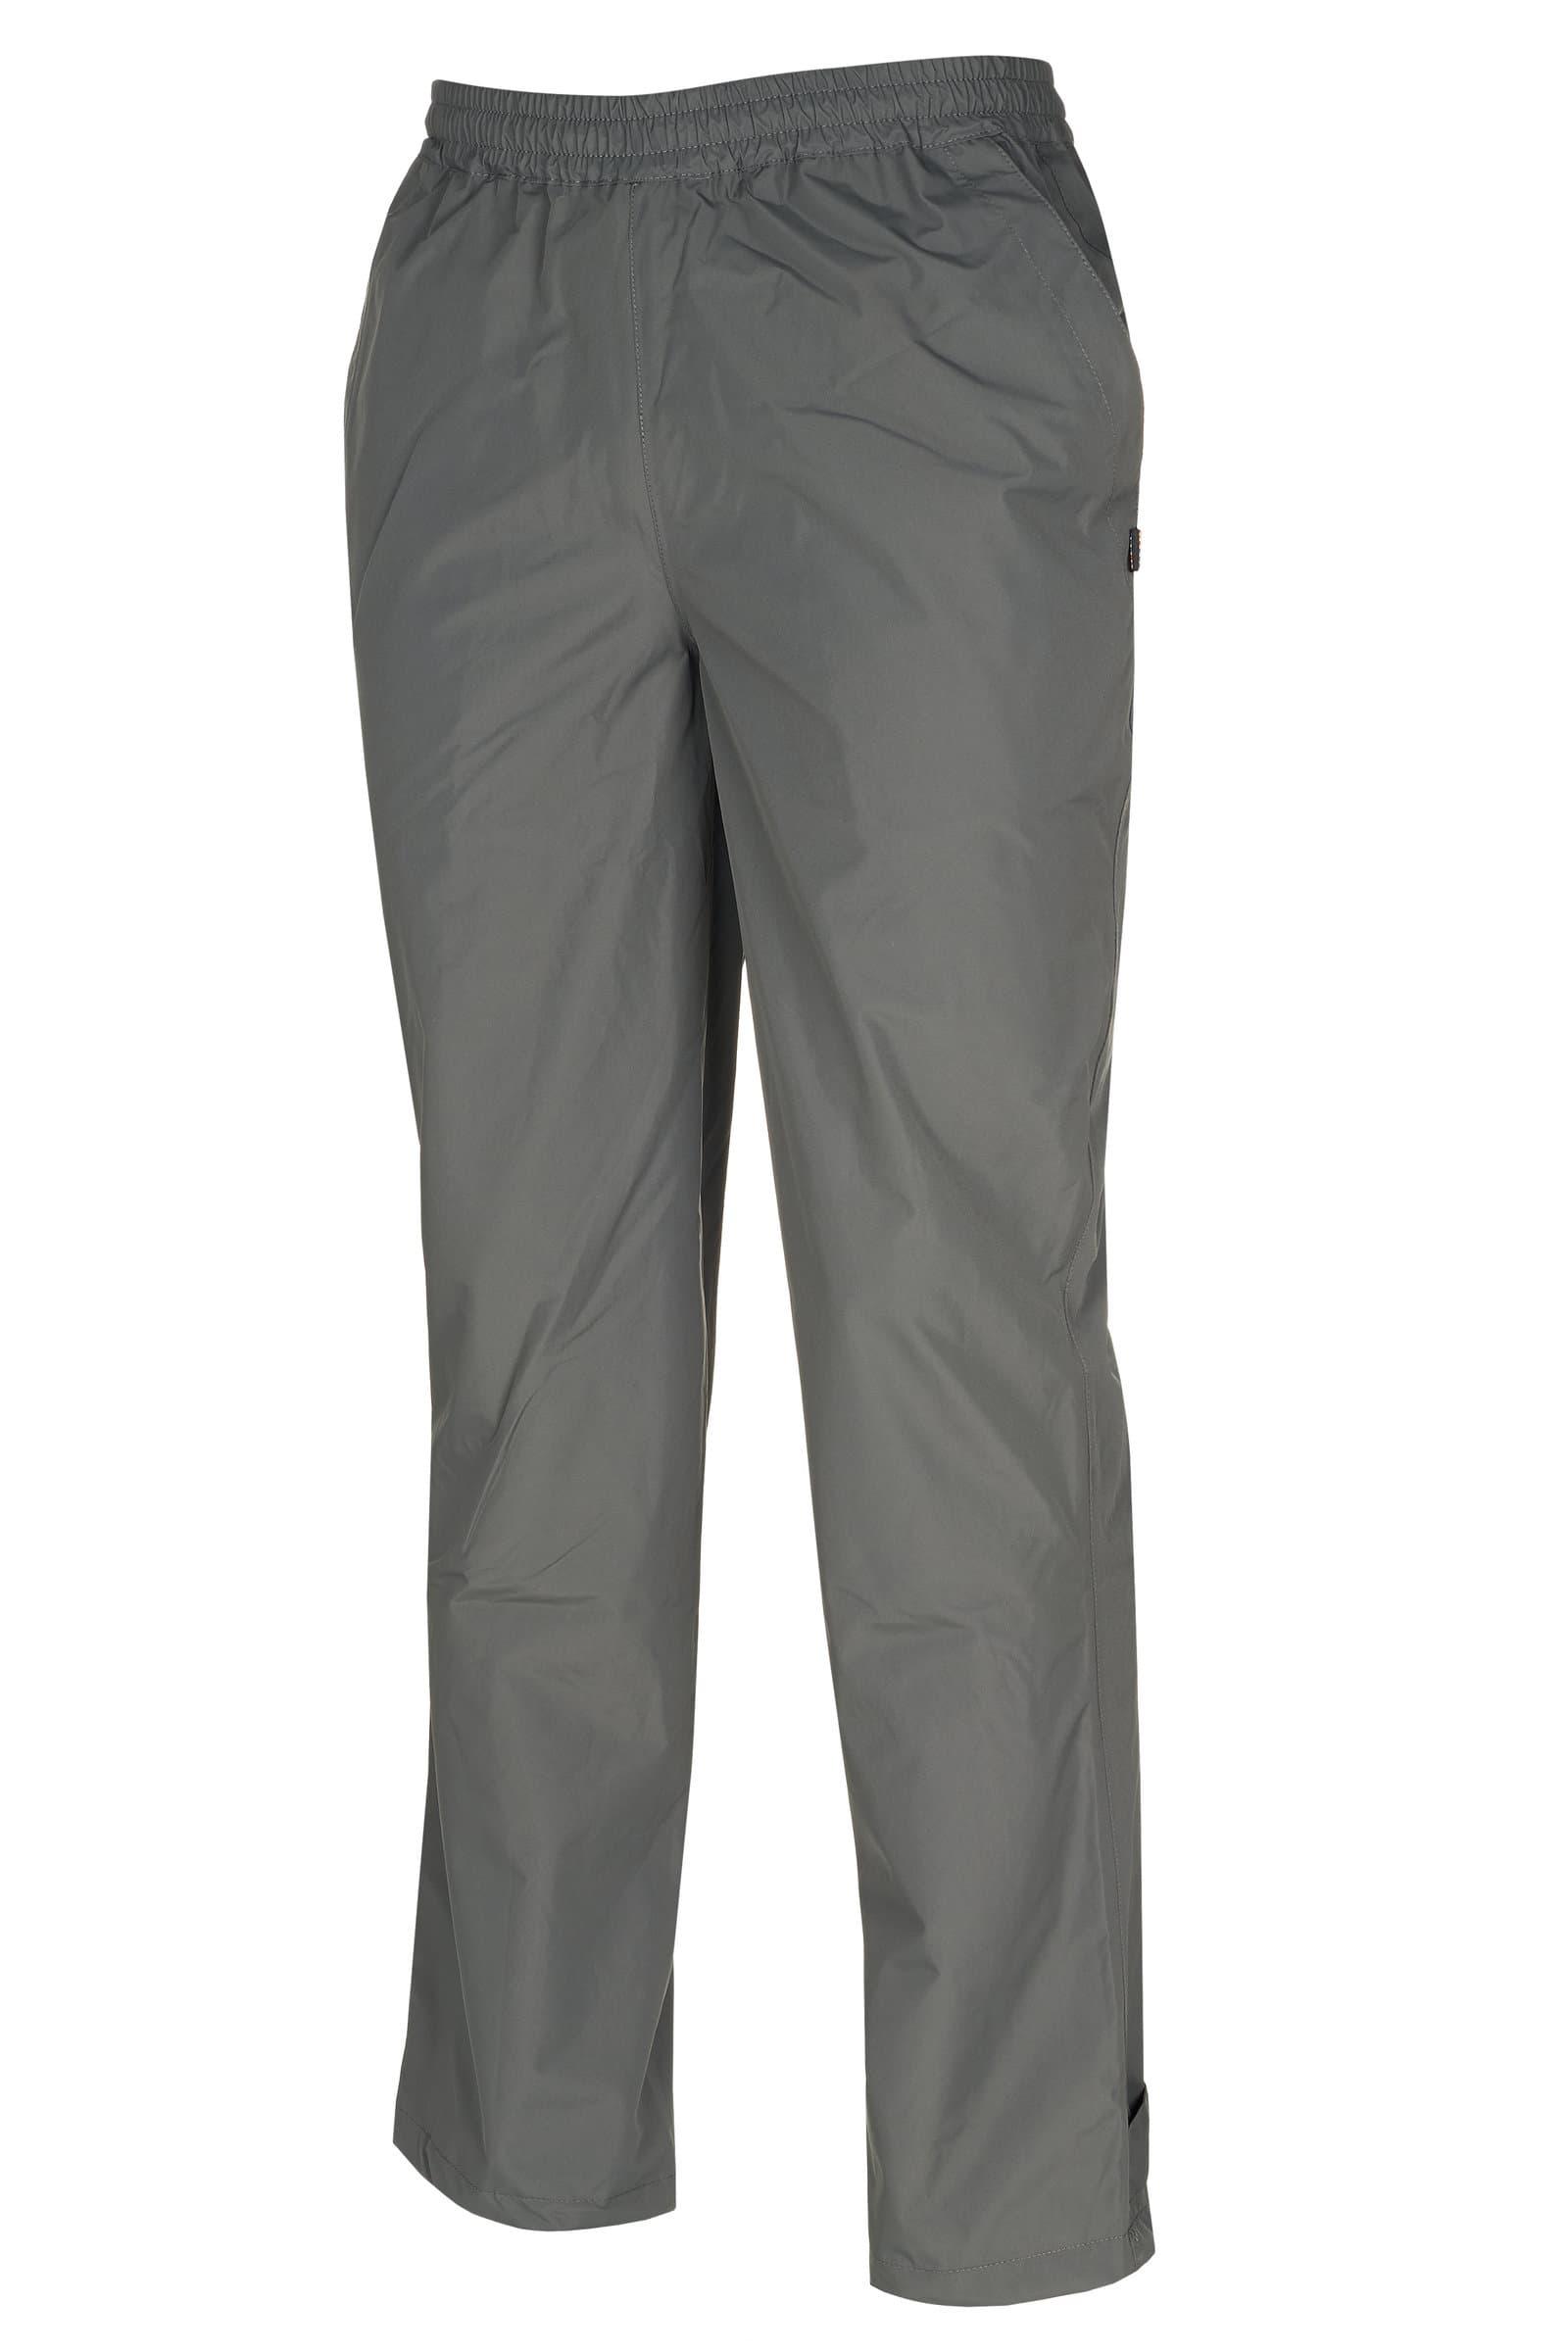 Rukka Coronada Pantalon de pluie pour femme